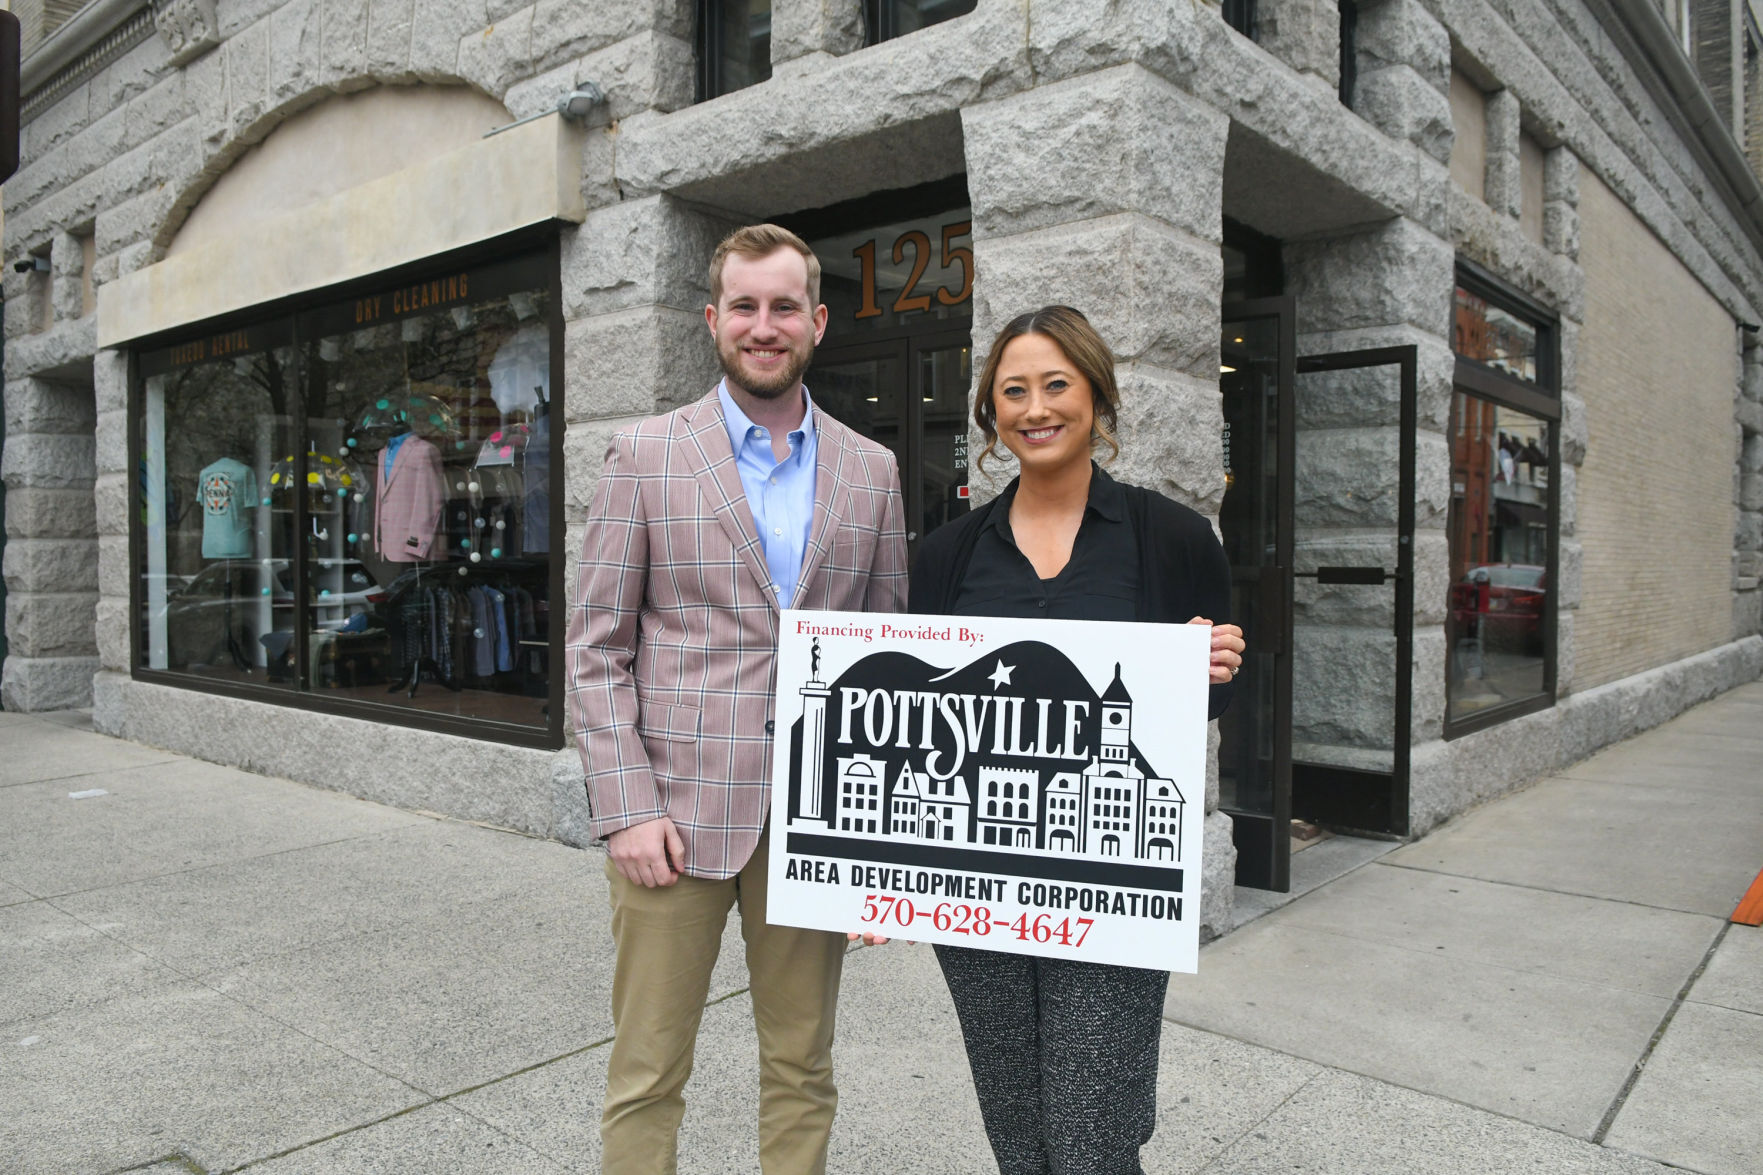 Pottsville Area Development Corp. presents 3 facade improvement grants